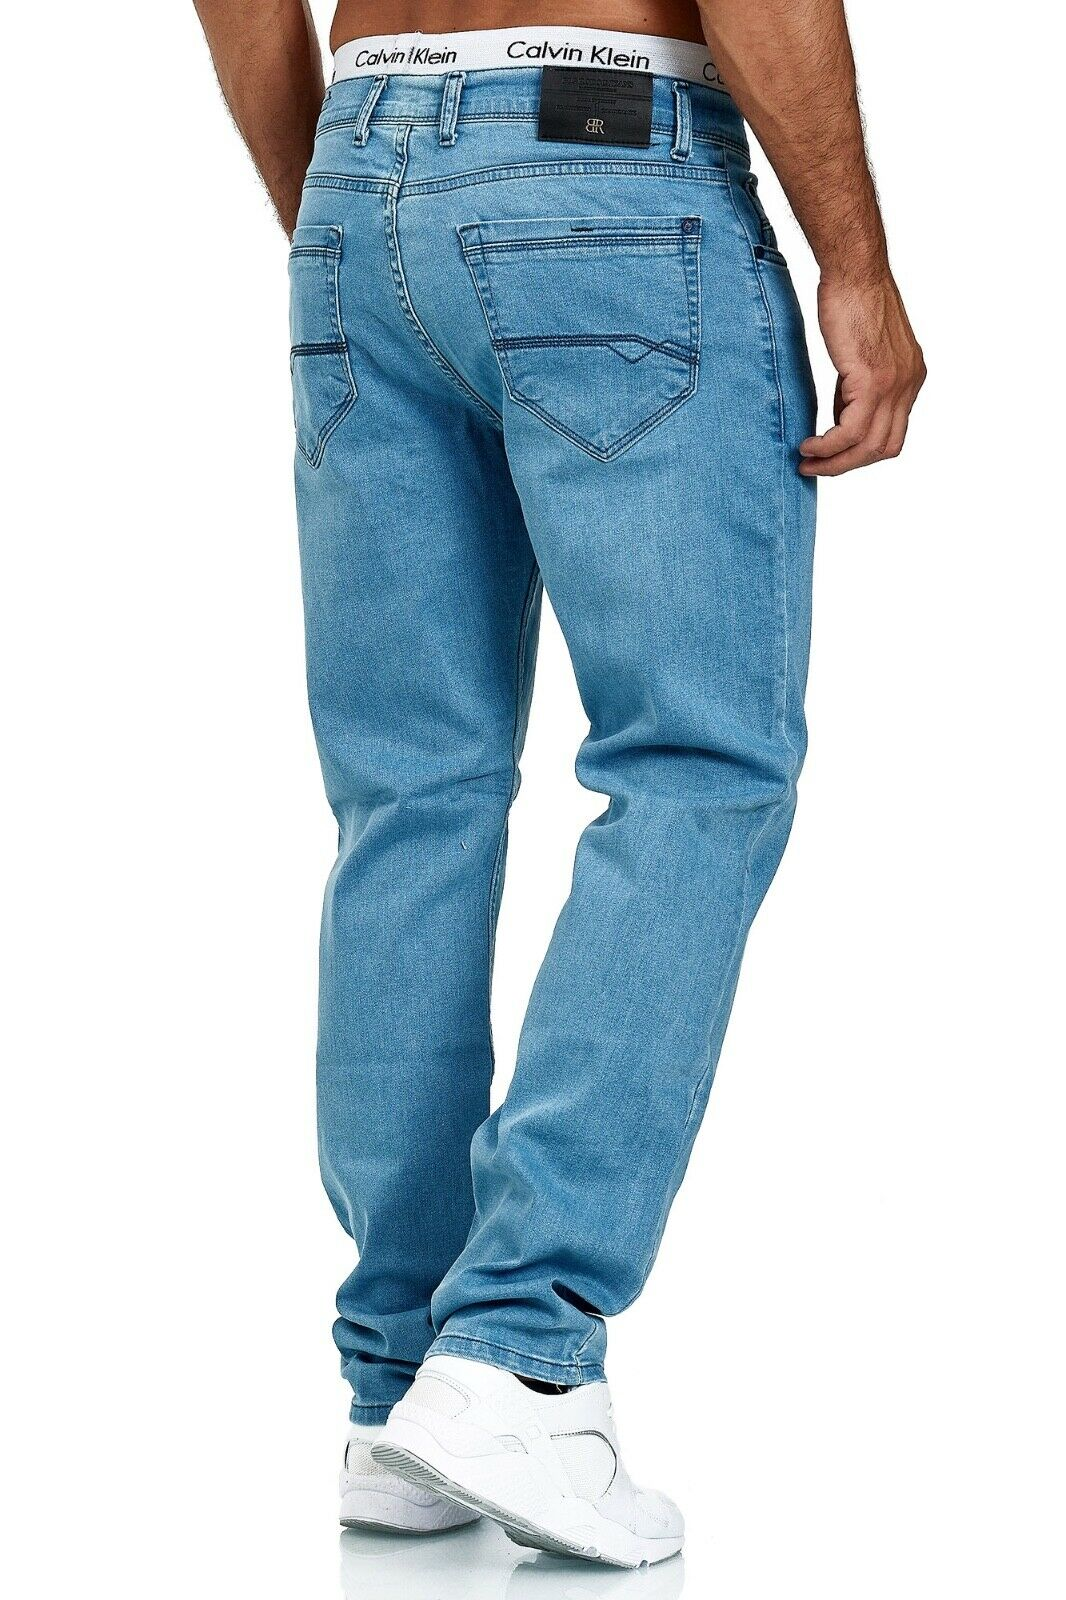 Herren-Jeans-Hose-Denim-KC-Black-Washed-Straight-Cut-Regular-Dicke-Naht-naehte Indexbild 74